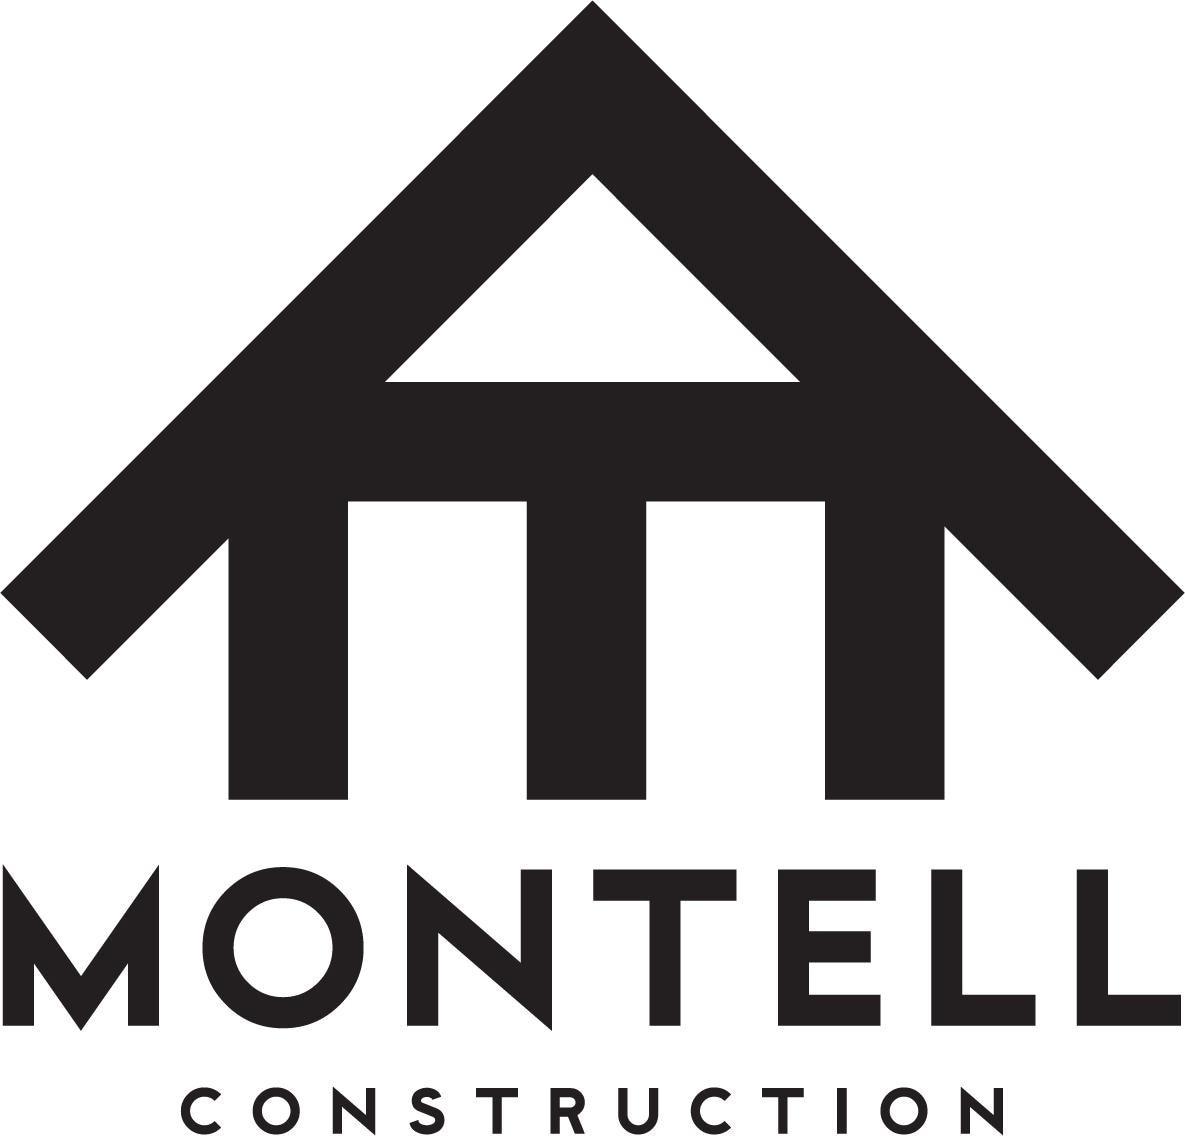 Montell Construction logo